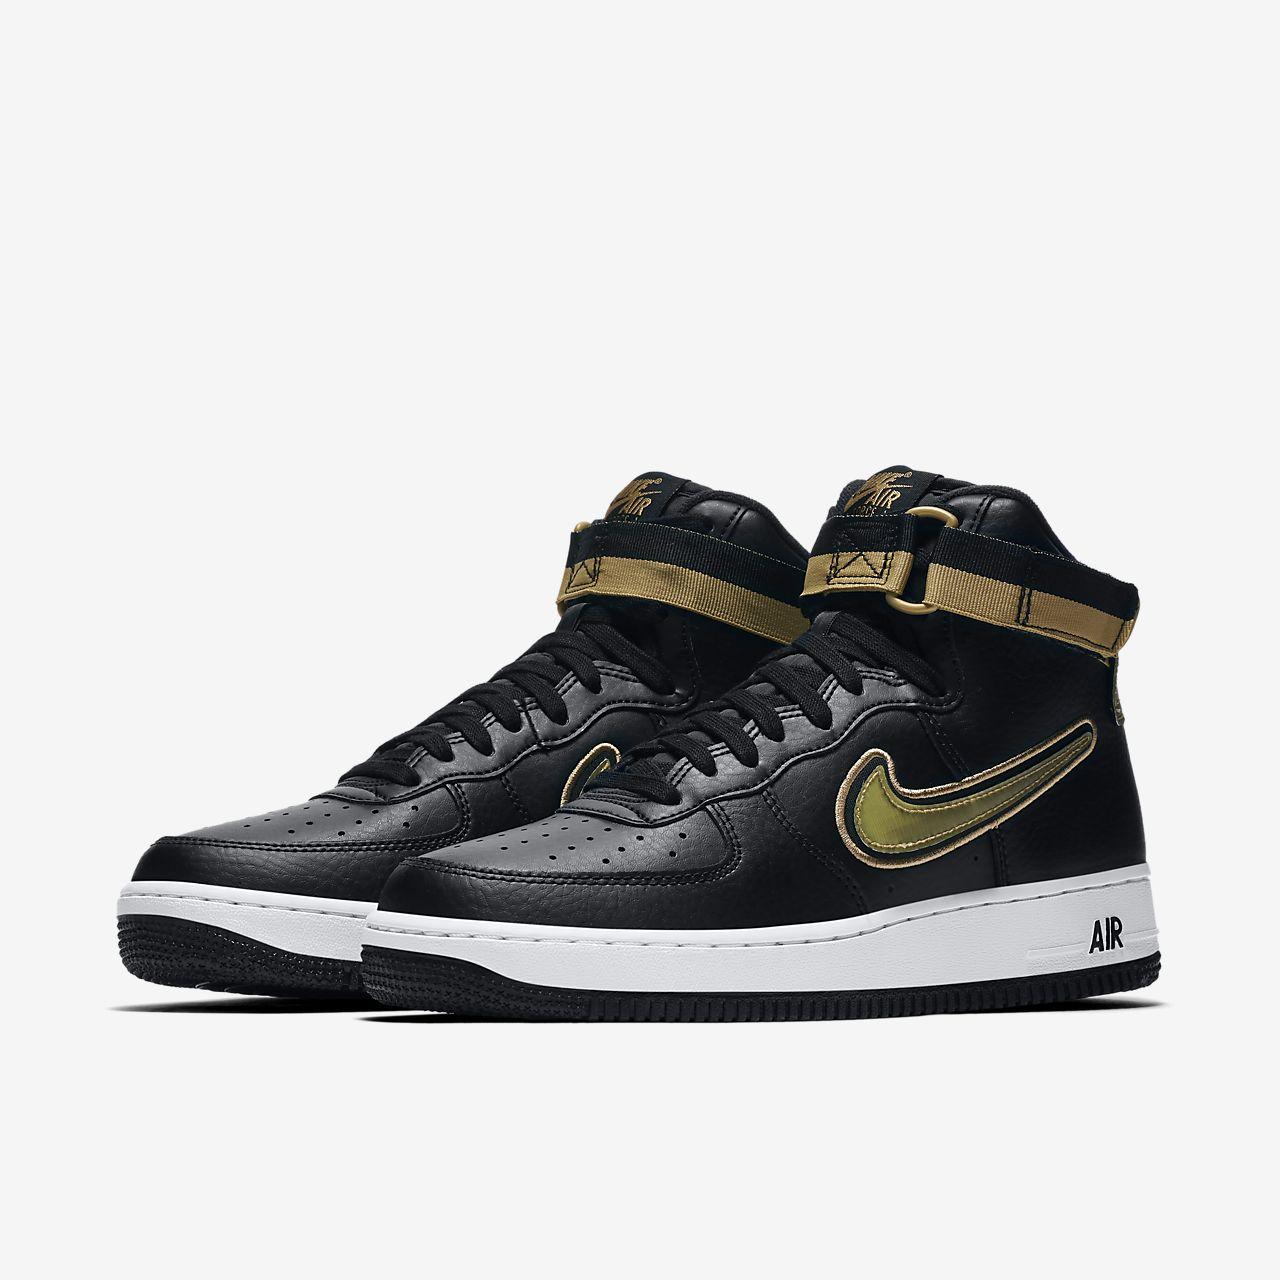 quality design ebcf3 cc338 ... Nike Air Force 1 High  07 LV8 Sport NBA Men s Shoe